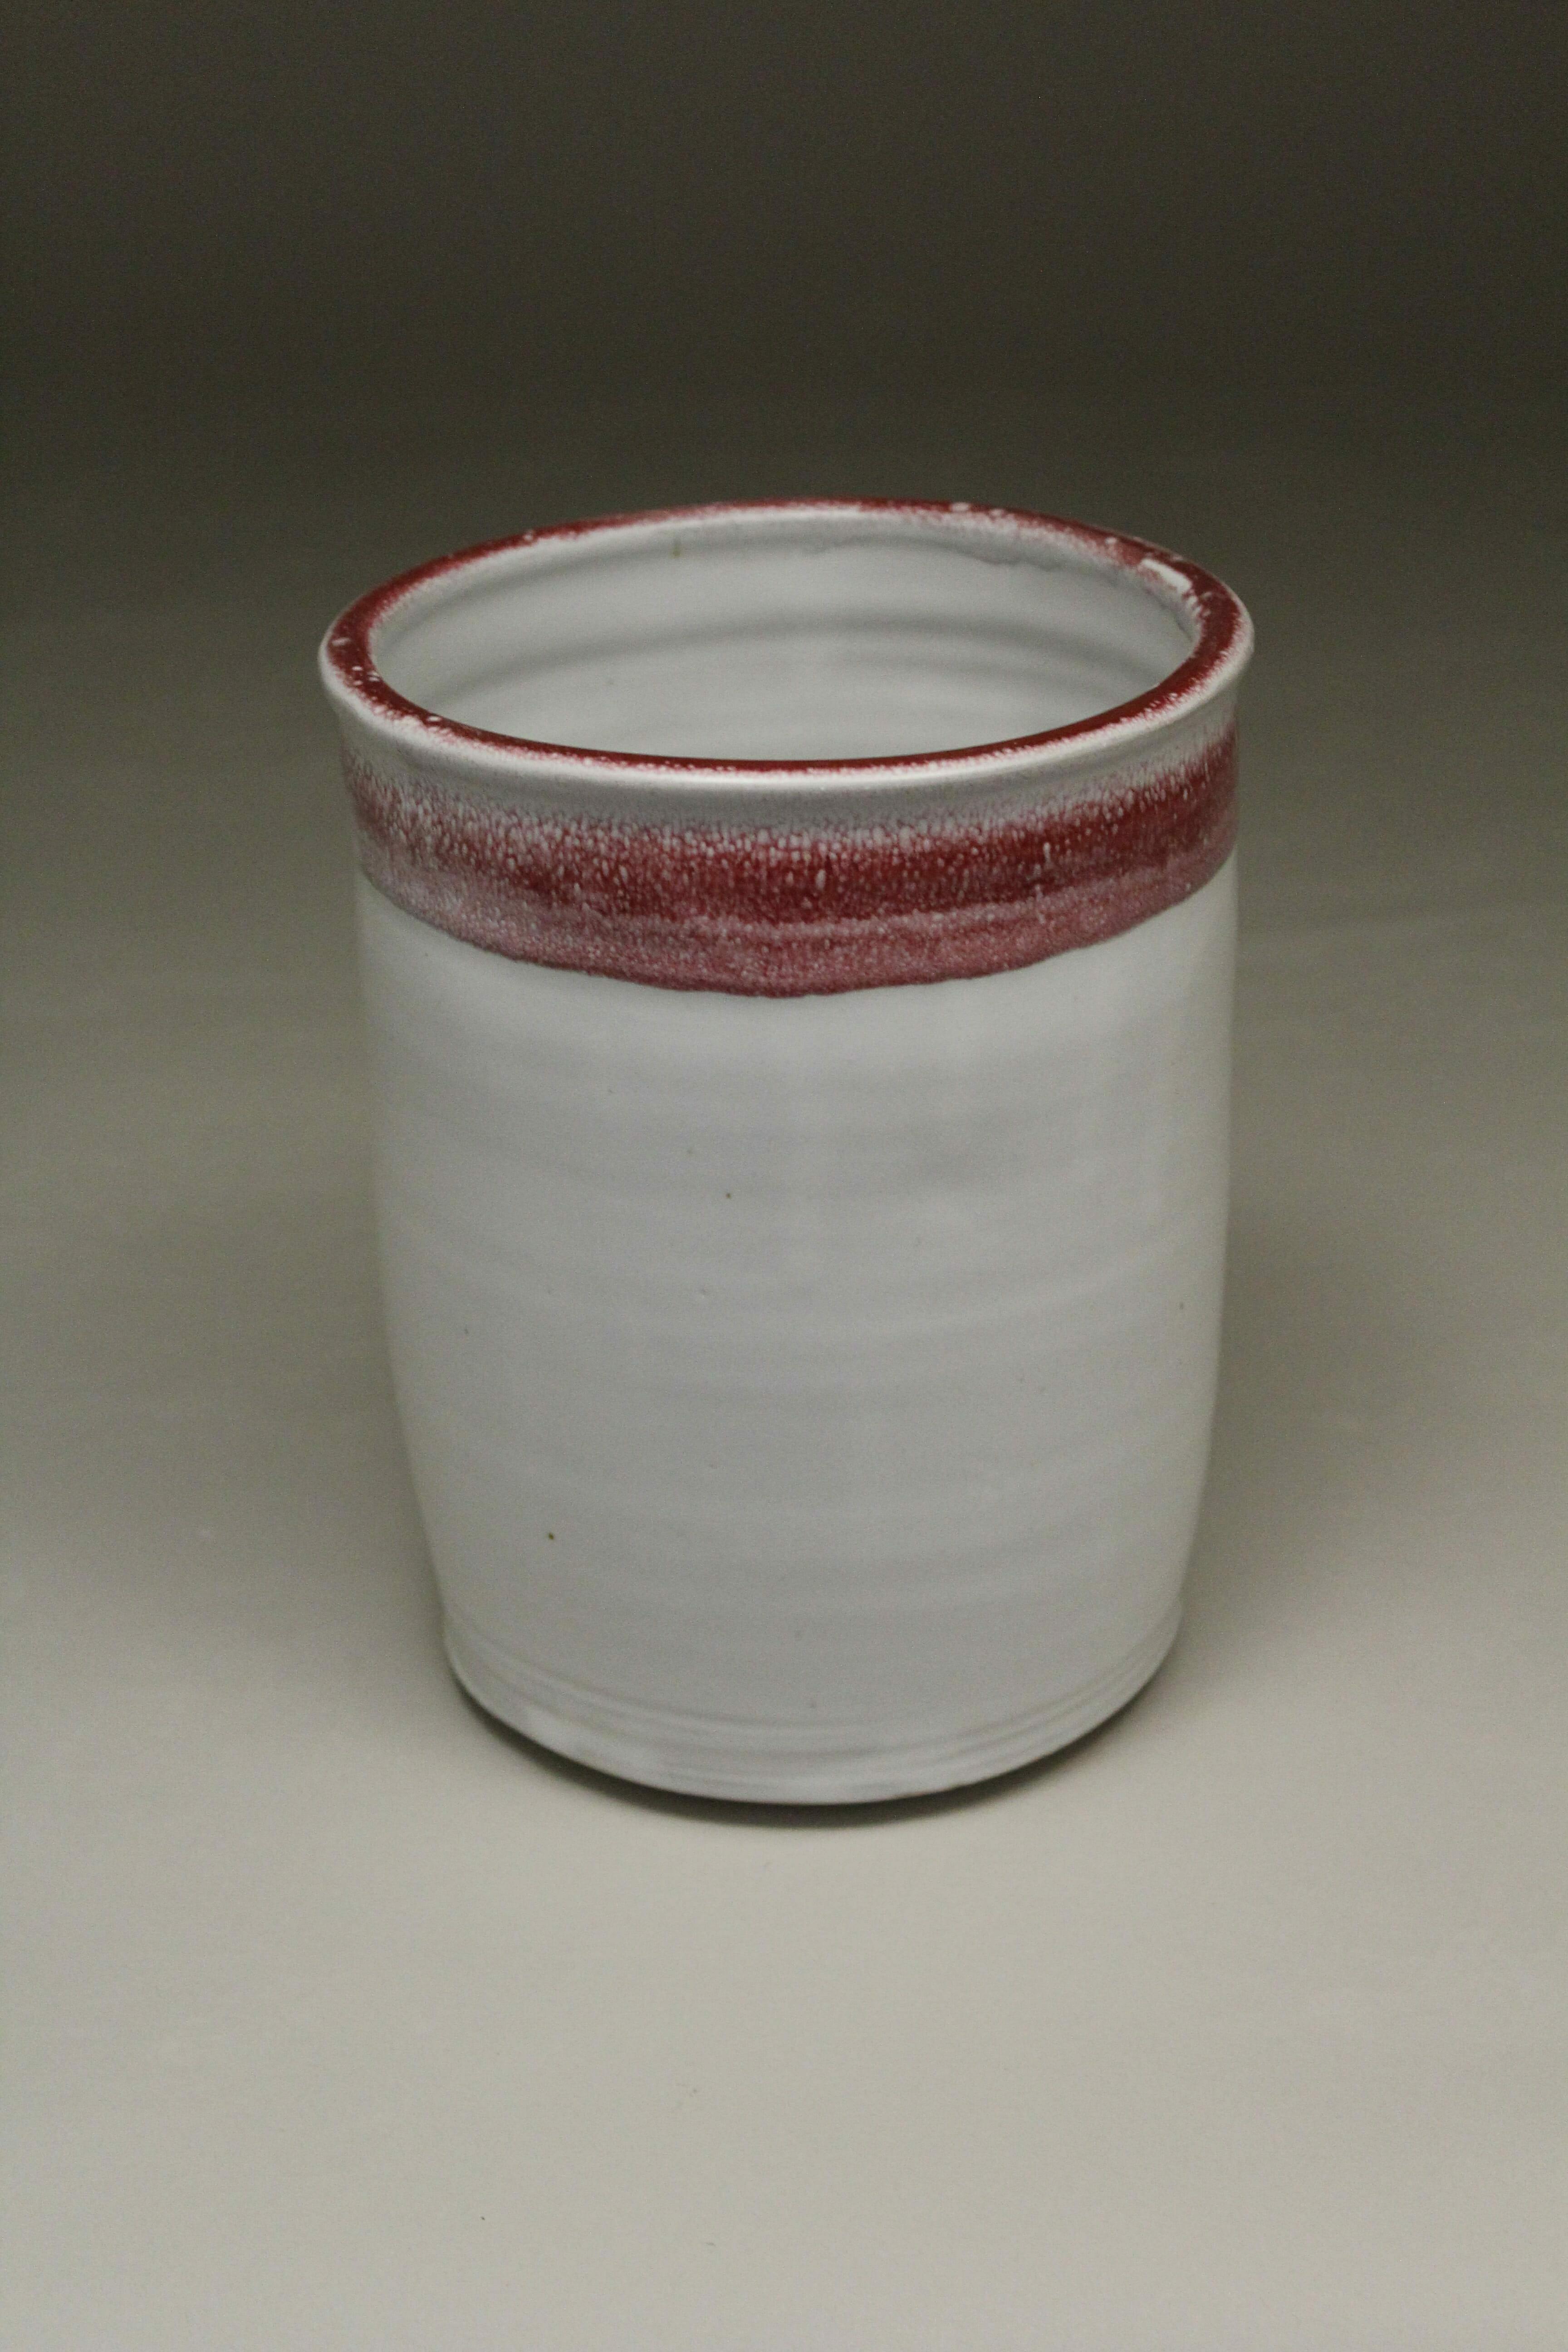 Utensil Holder Smooth Design in White and Red Glaze